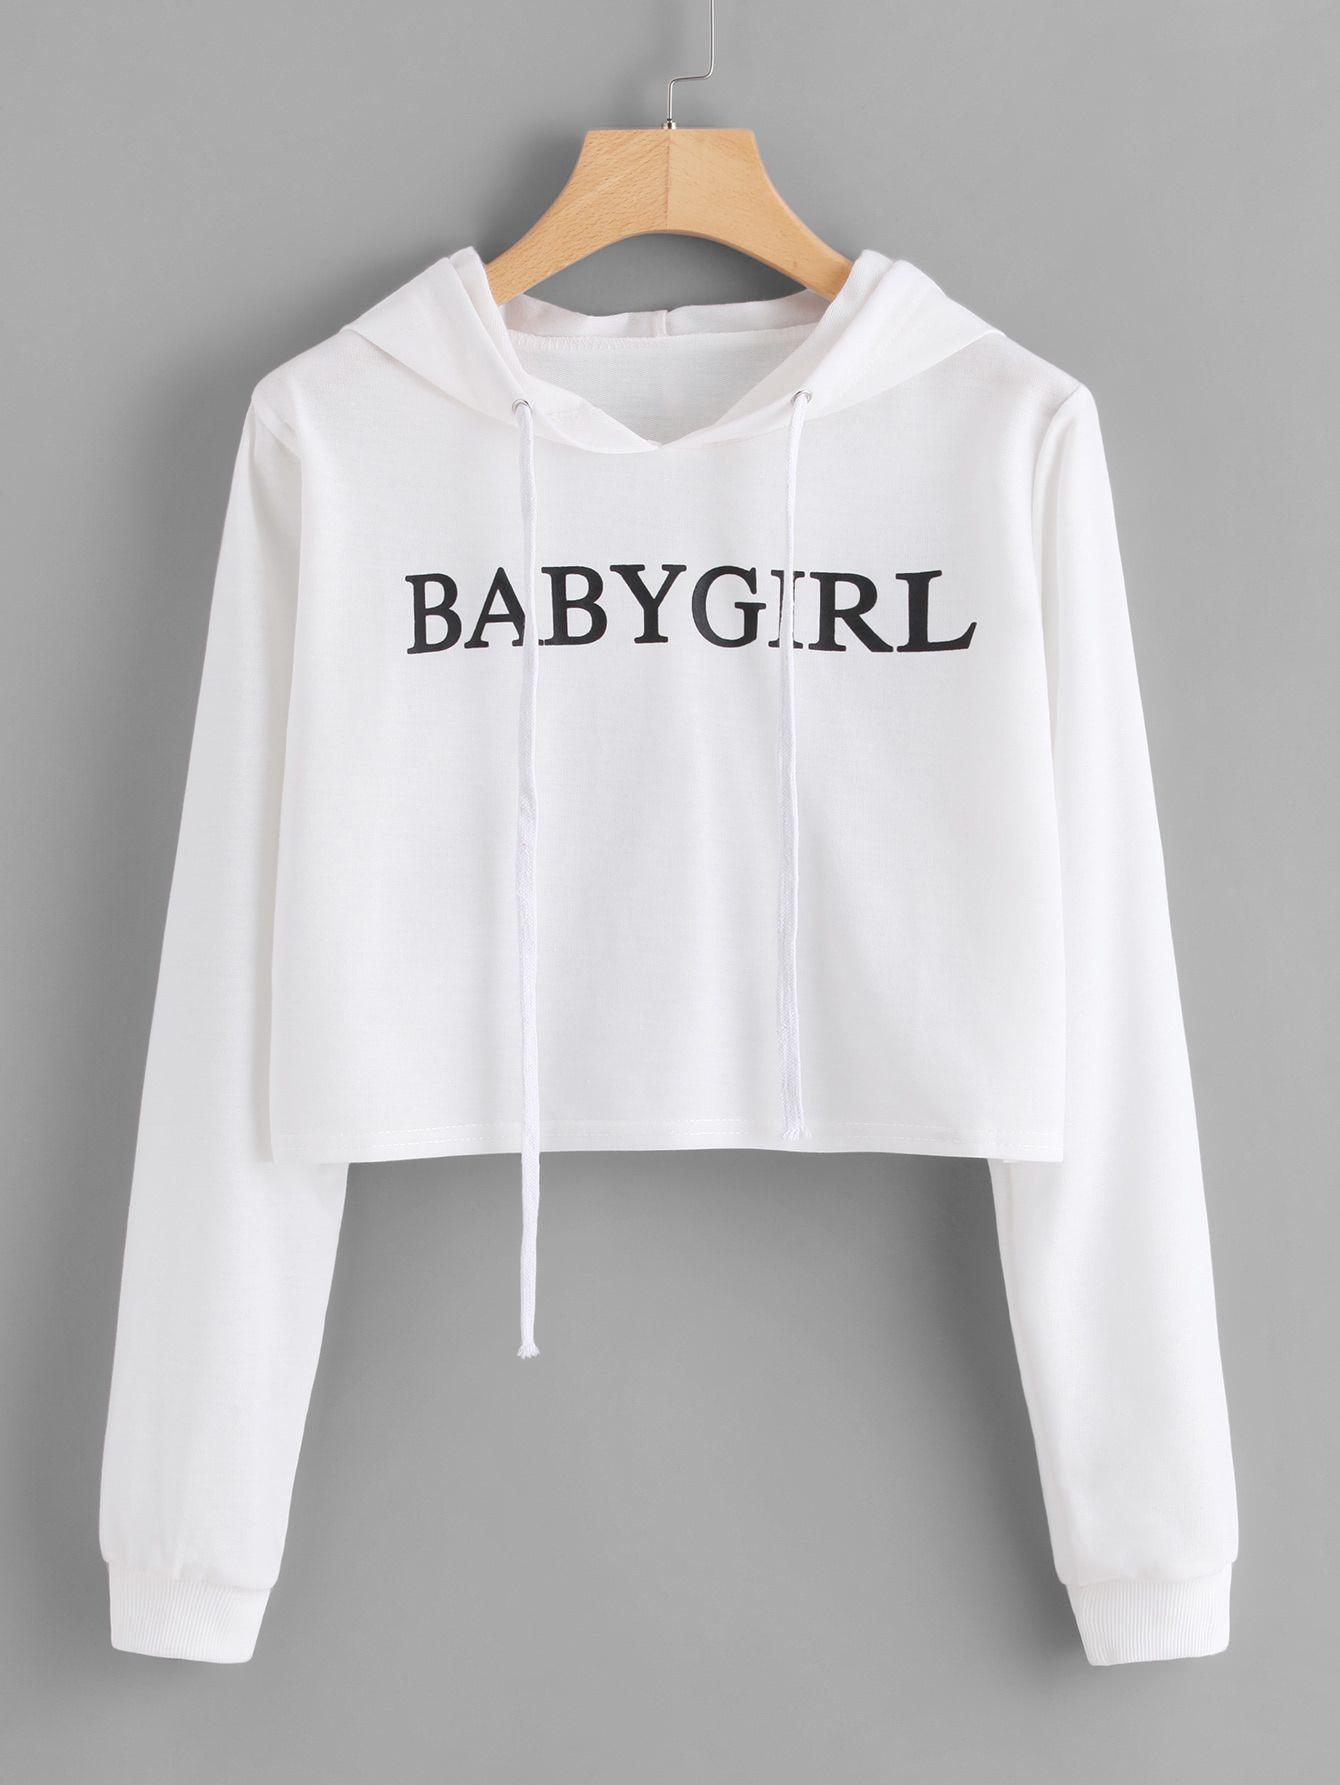 Transparent tumblr sweatshirts